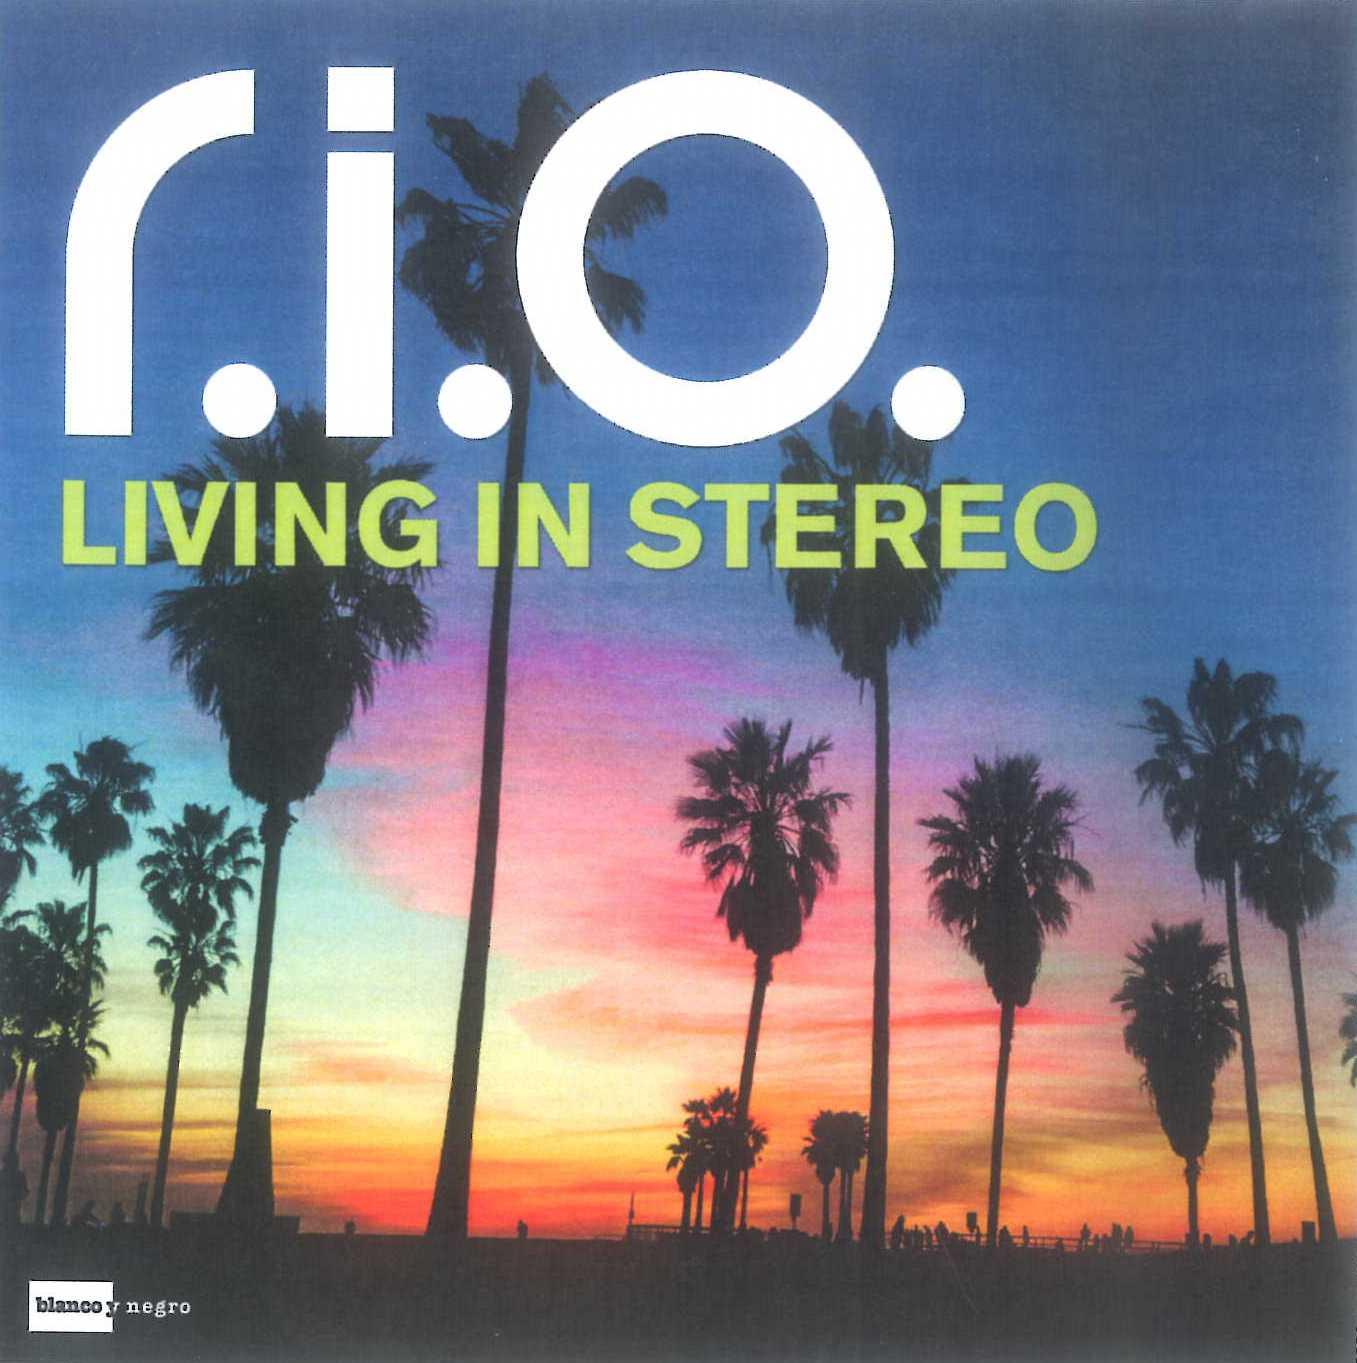 Living in stereo